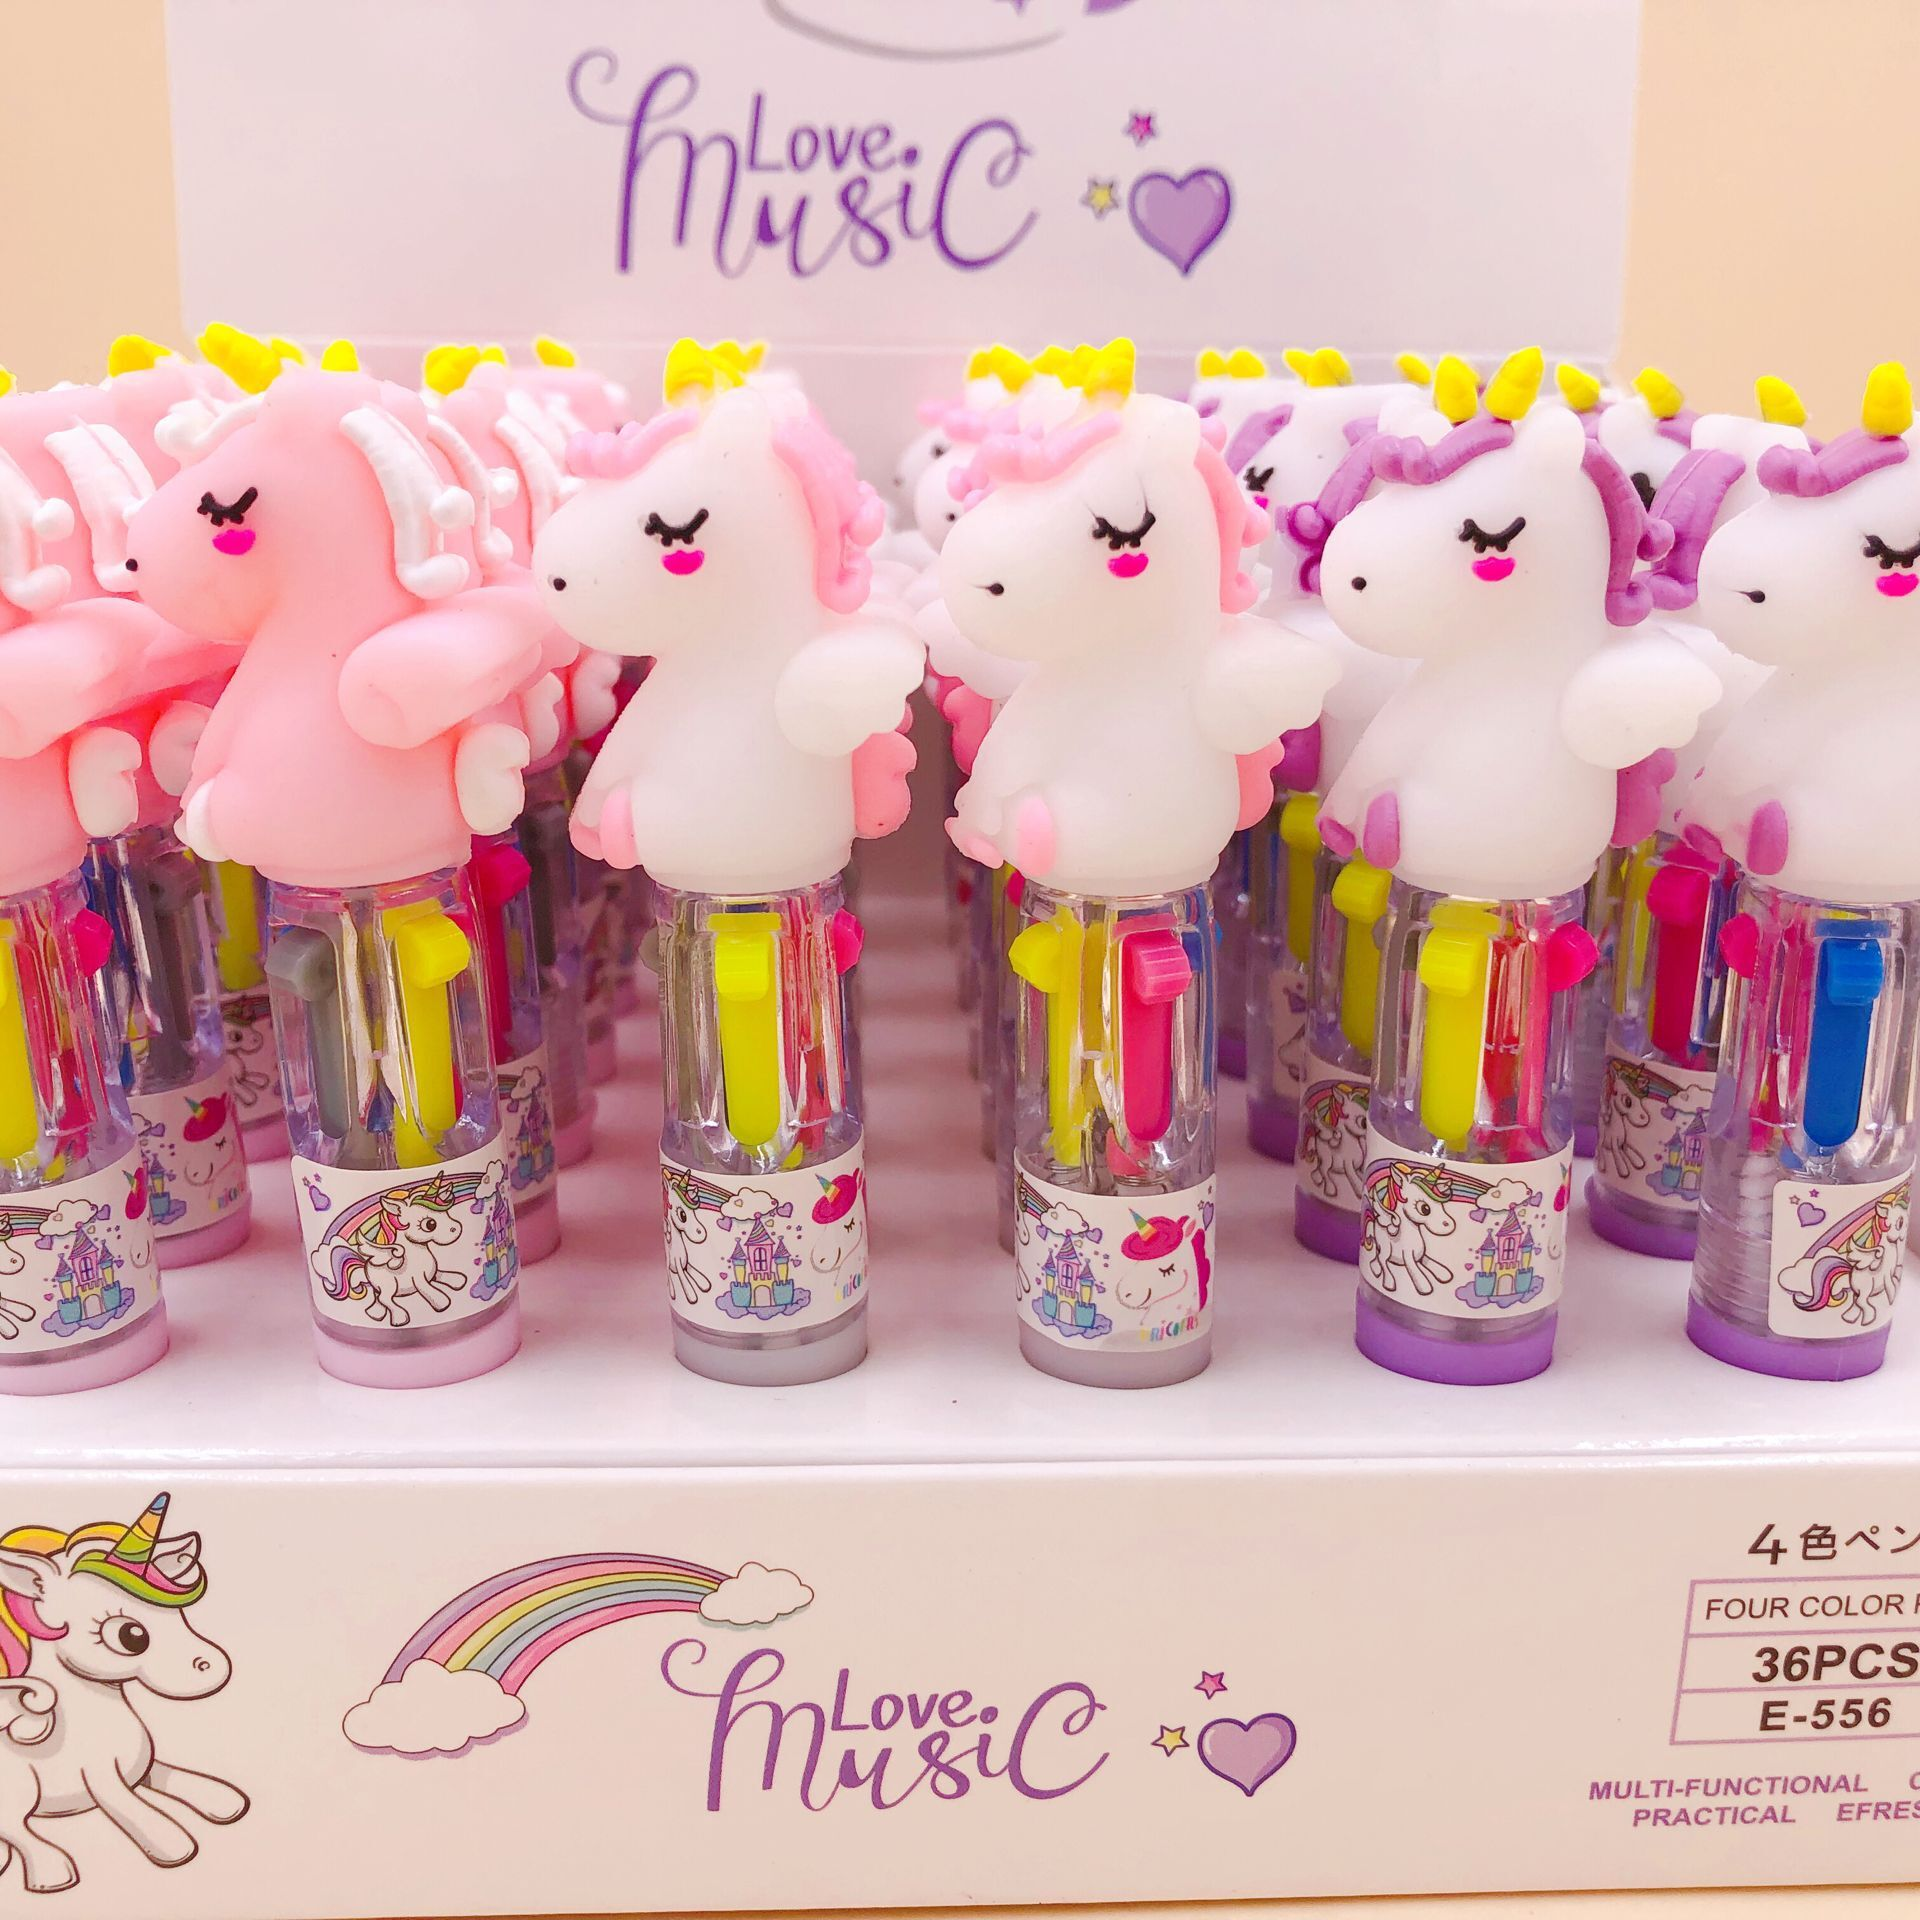 3 Pcs/lot Silicone Unicorn Mini 4 Colors Ballpoint Pen School Office Supply Gift Stationery Papelaria Escolar